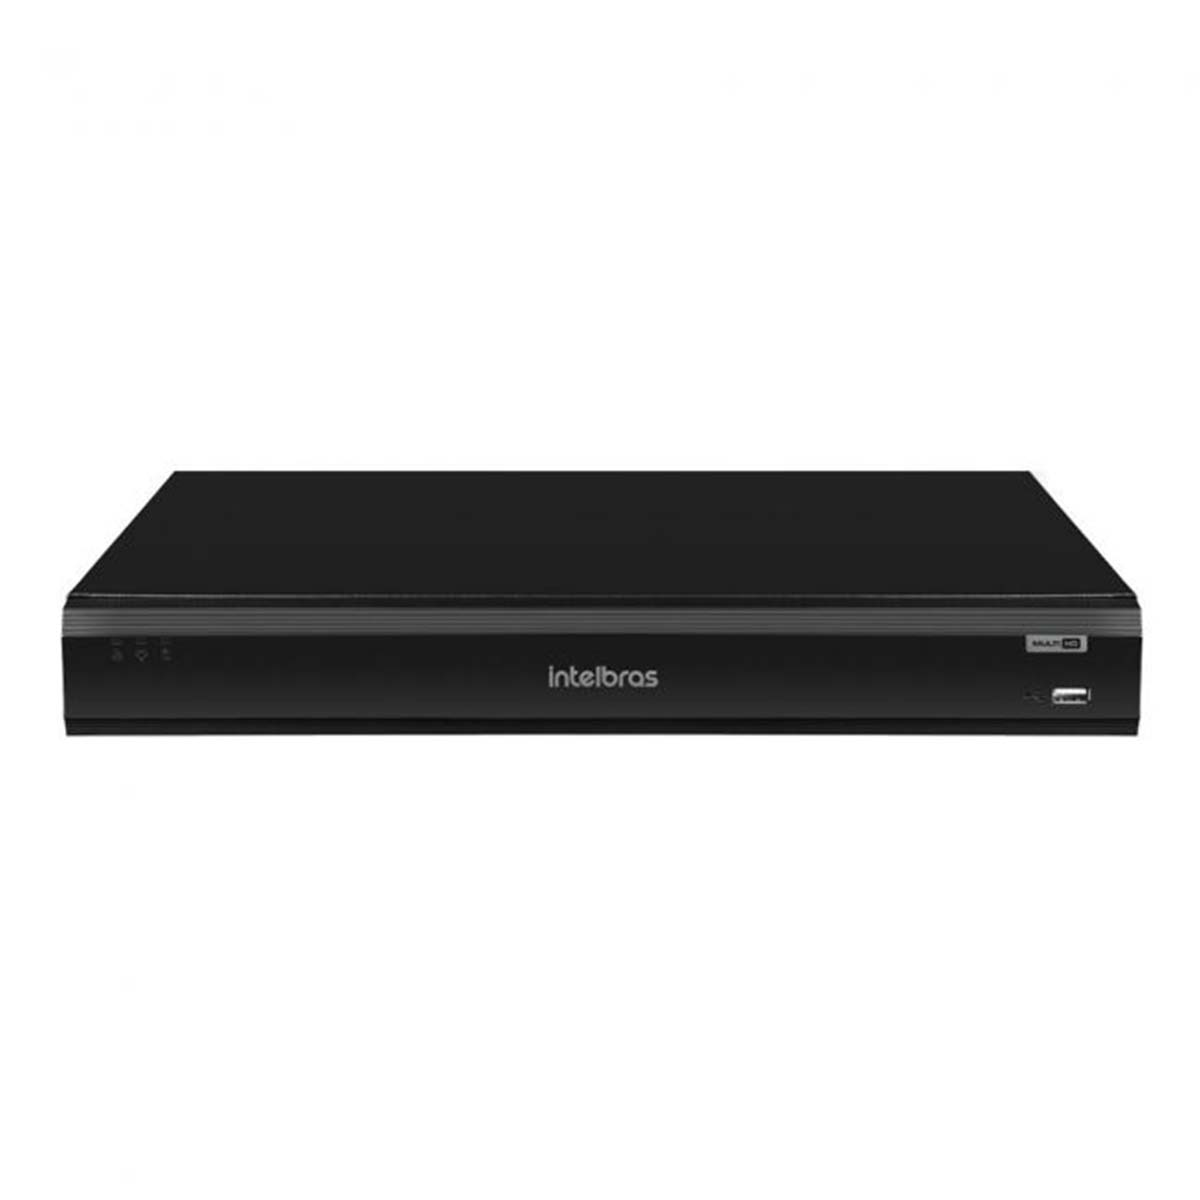 STAND ALONE INTELBRAS DVR IMHDX 3016 C/ HD 1TB